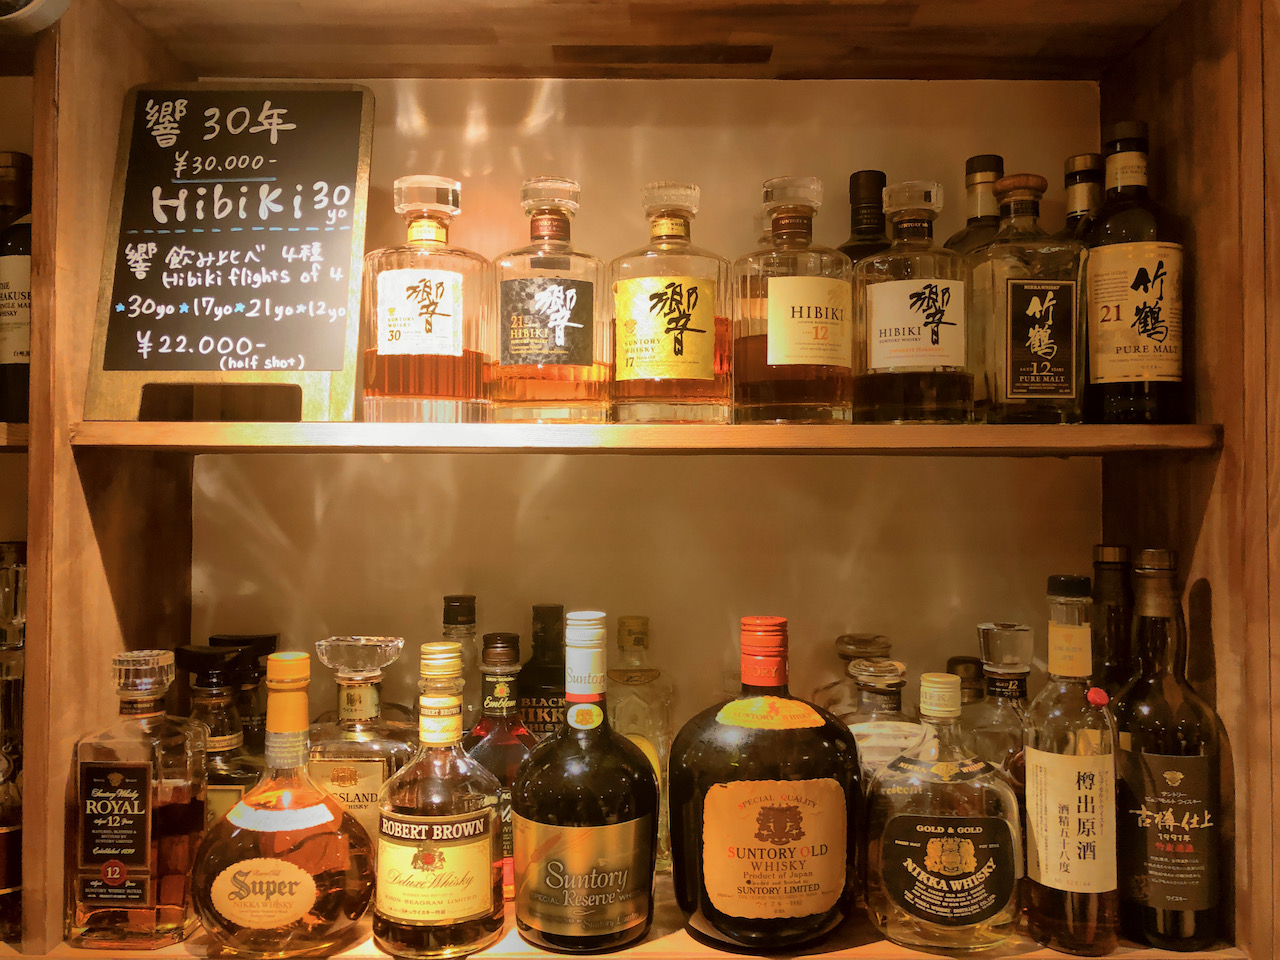 Whiskey Bar in Kyōto, Japan (15.09.2019)